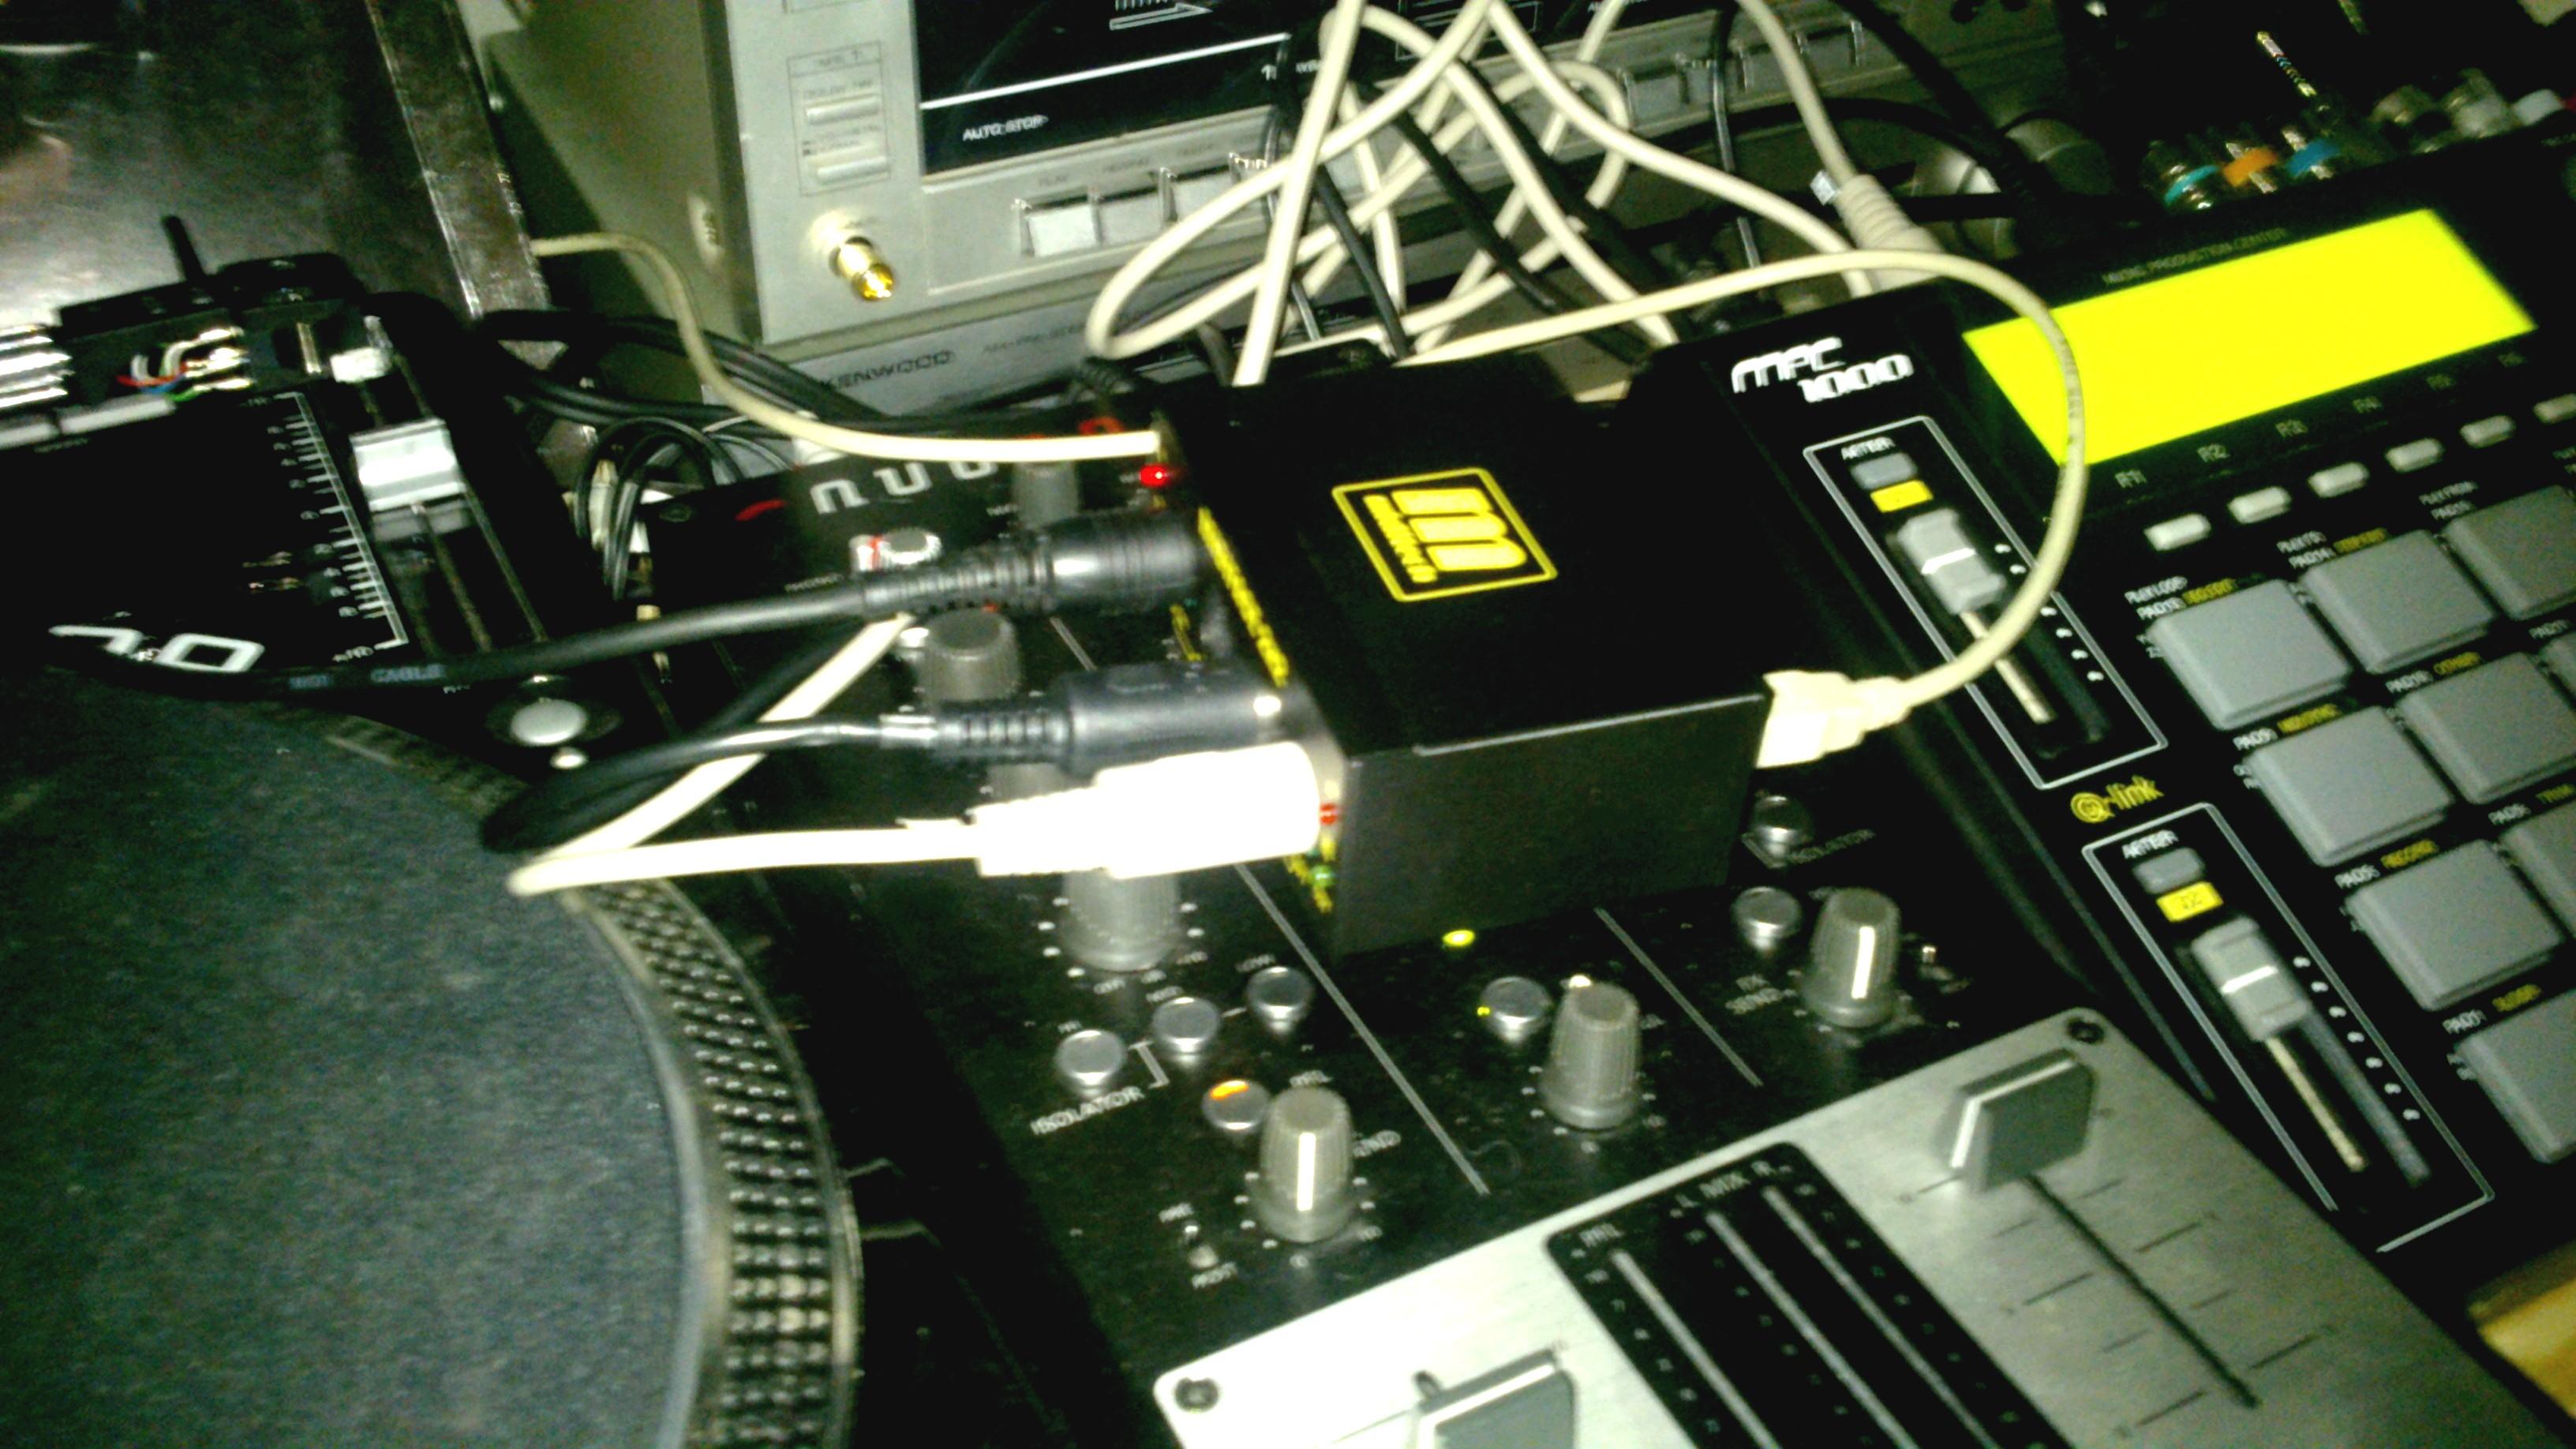 Miditech MIDIFACE 2x2 USB MIDI Interfac e